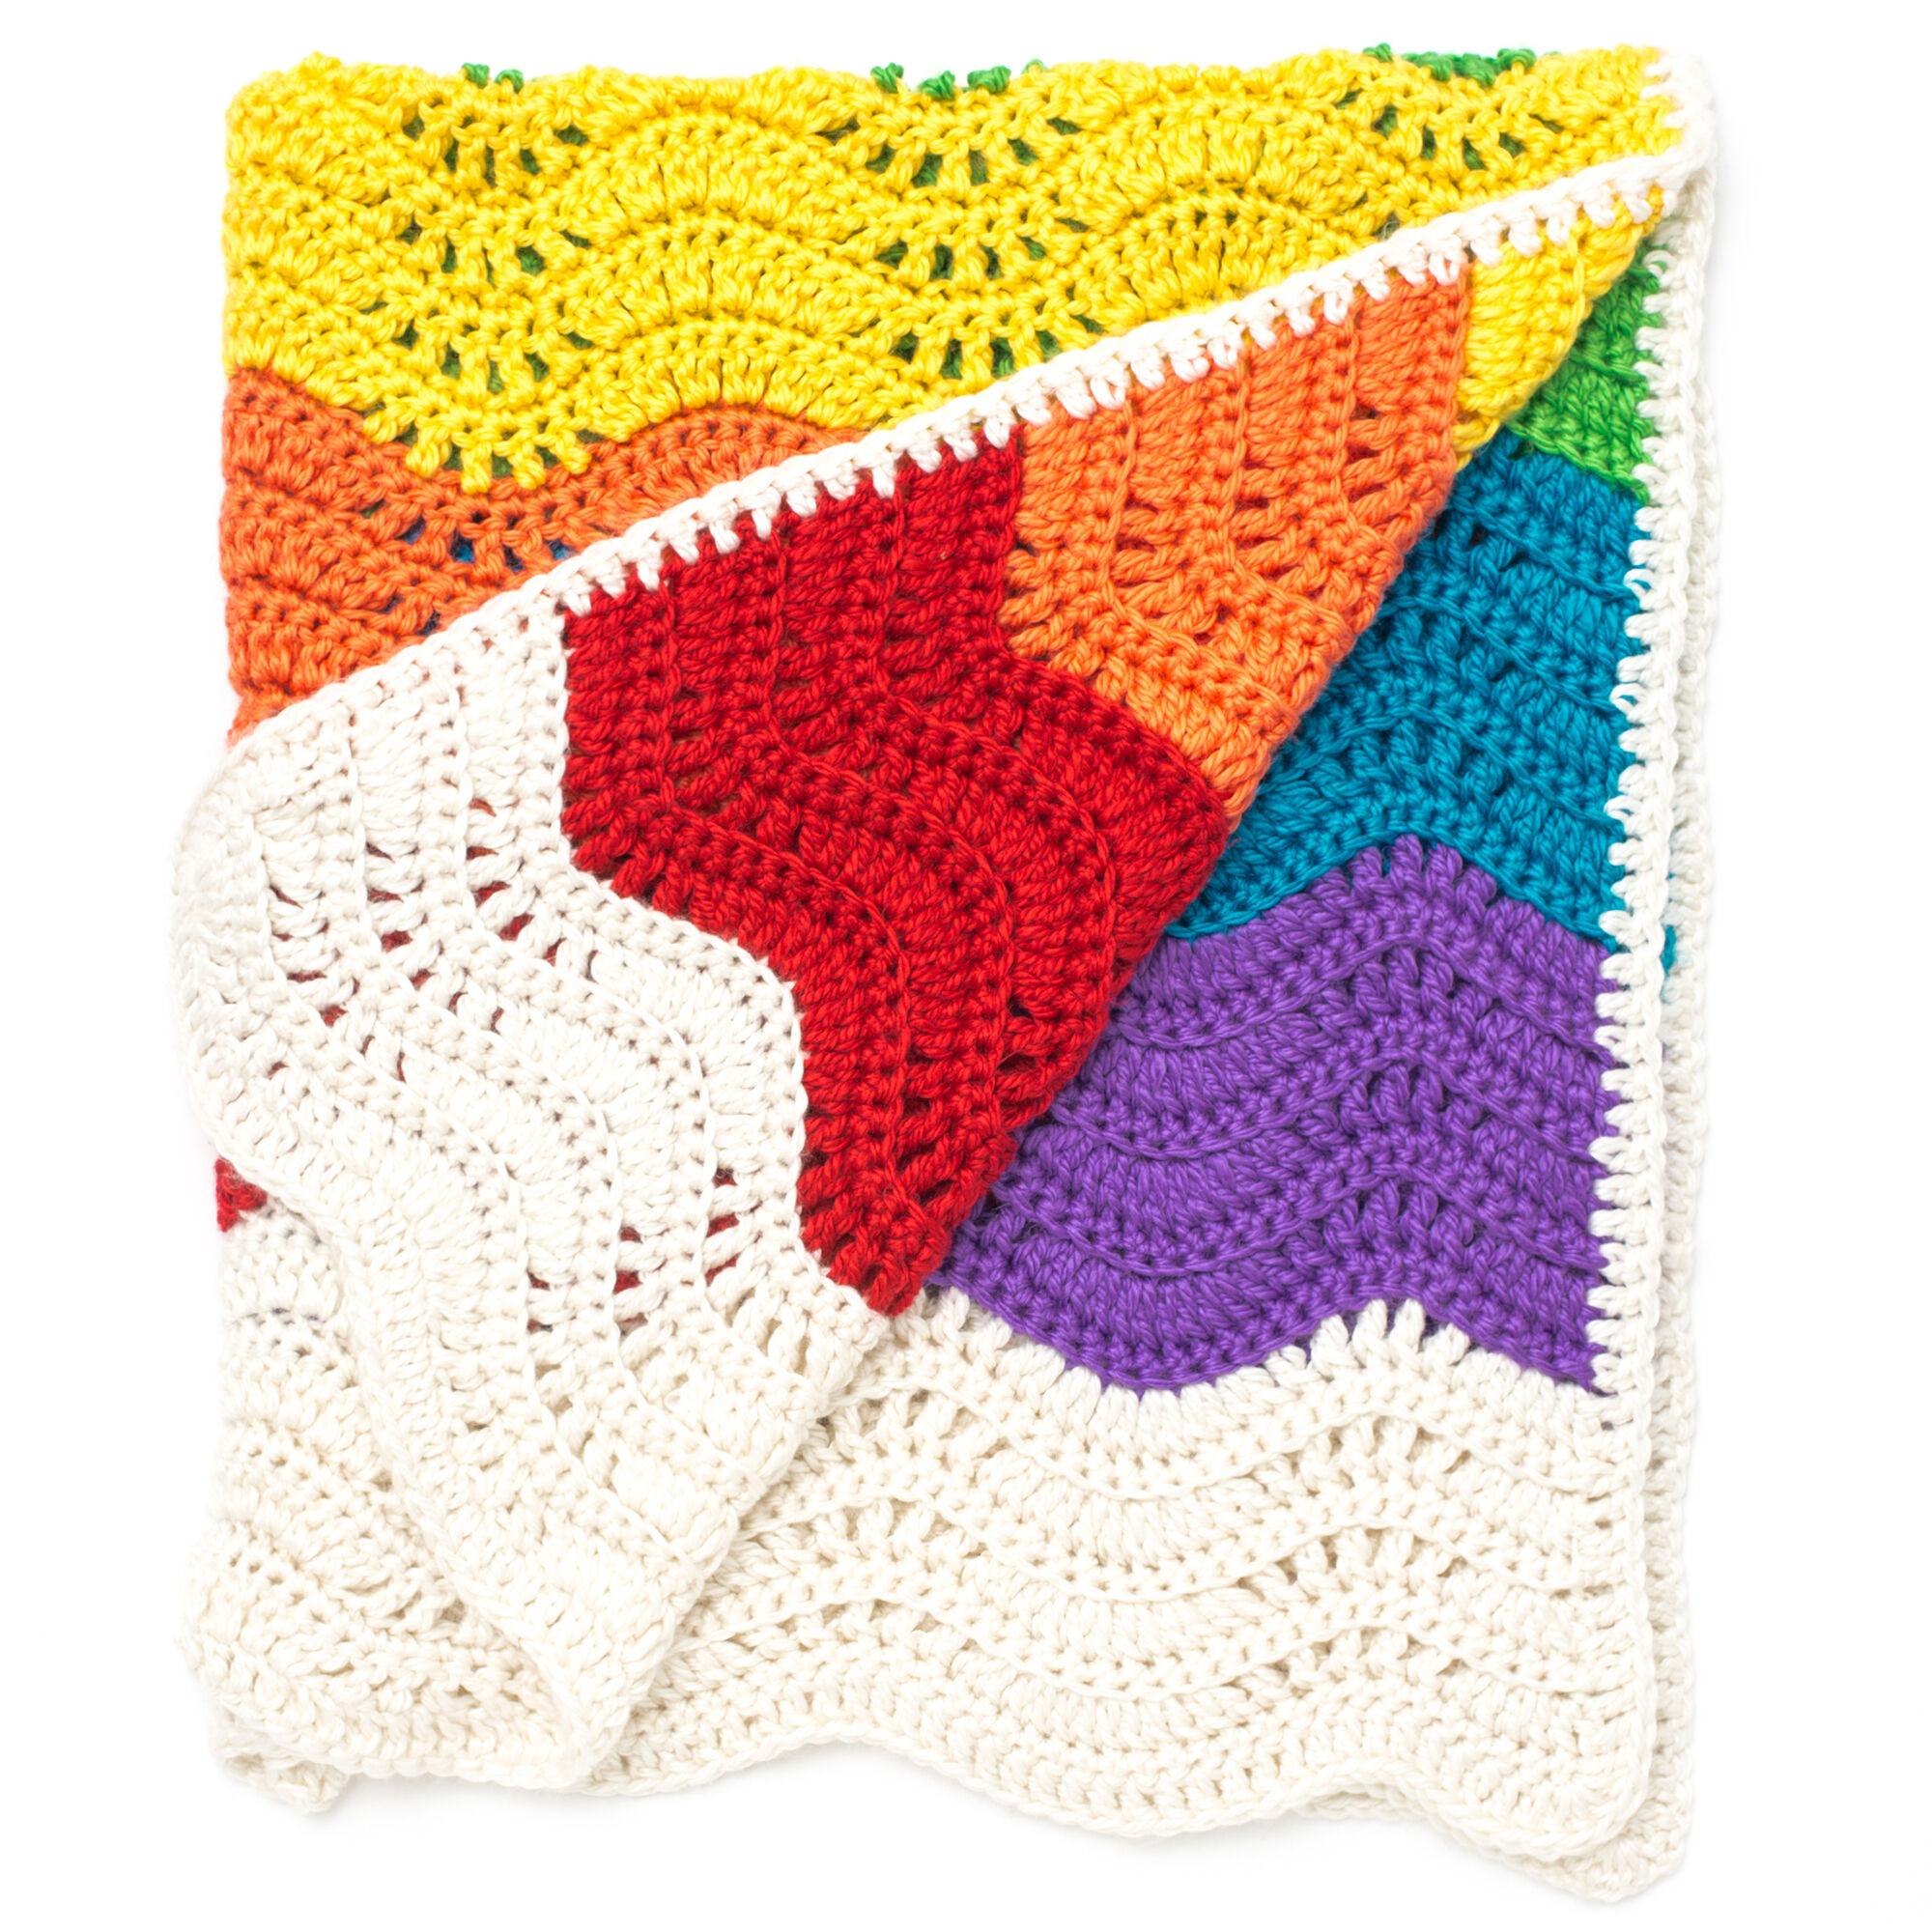 Bernat End of the Rainbow Blanket | Yarnspirations